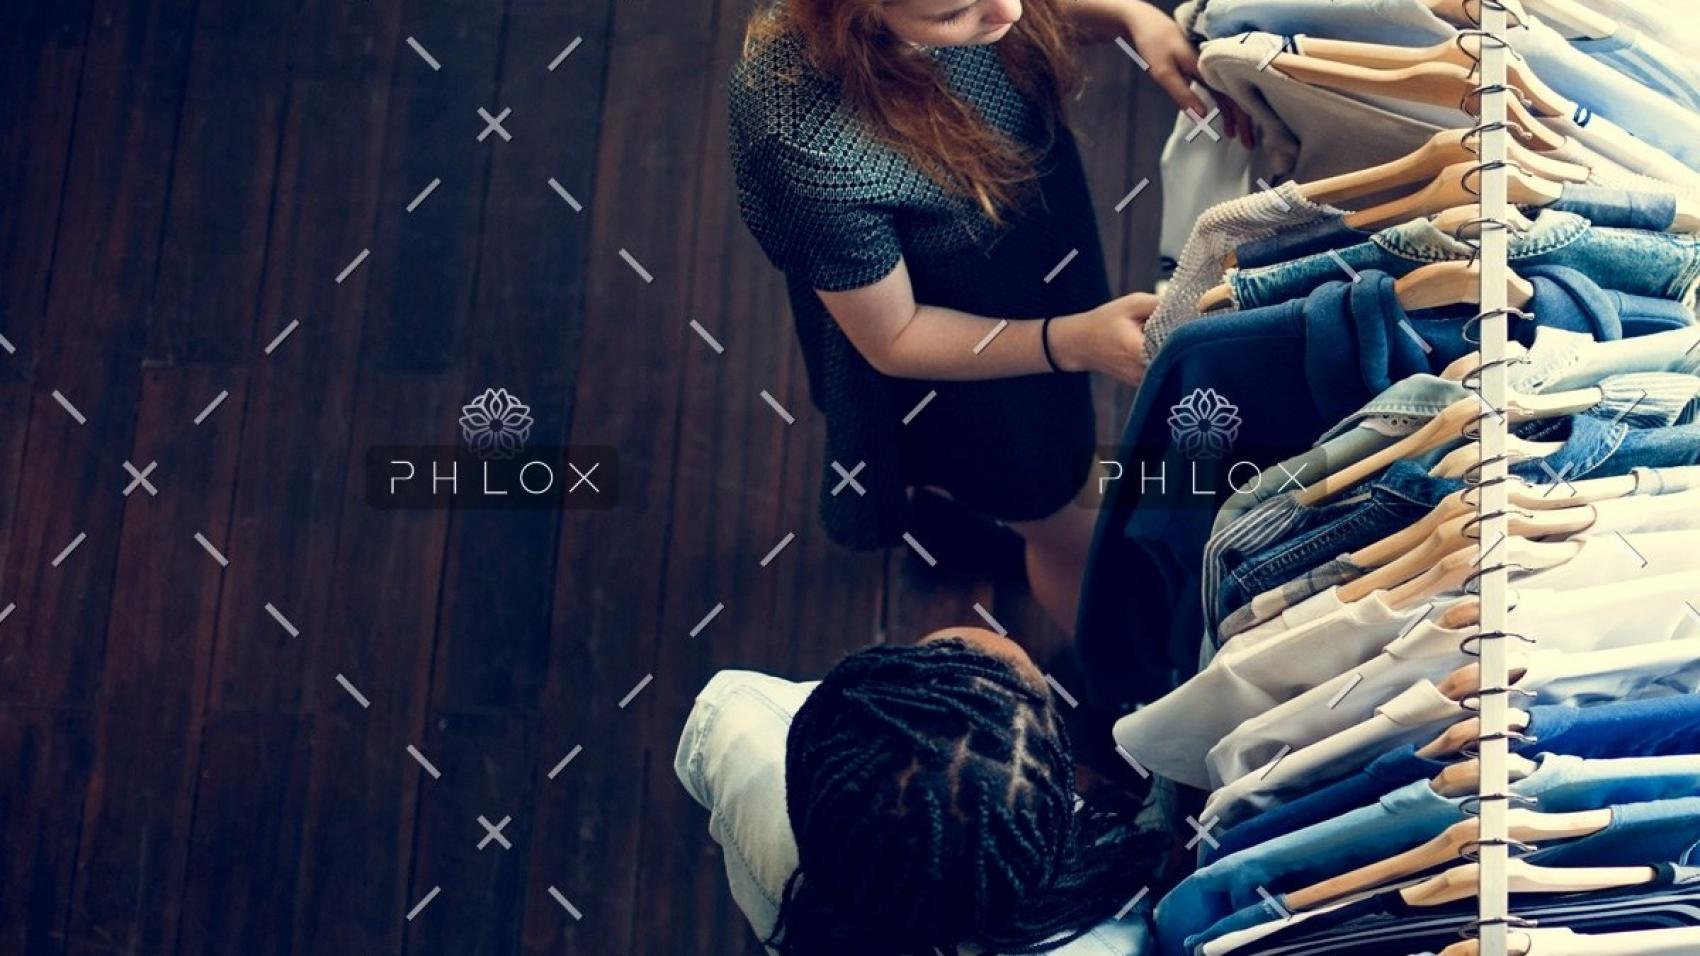 demo-attachment-138-clothes-shop-costume-dress-fashion-store-style-P7HP5QN